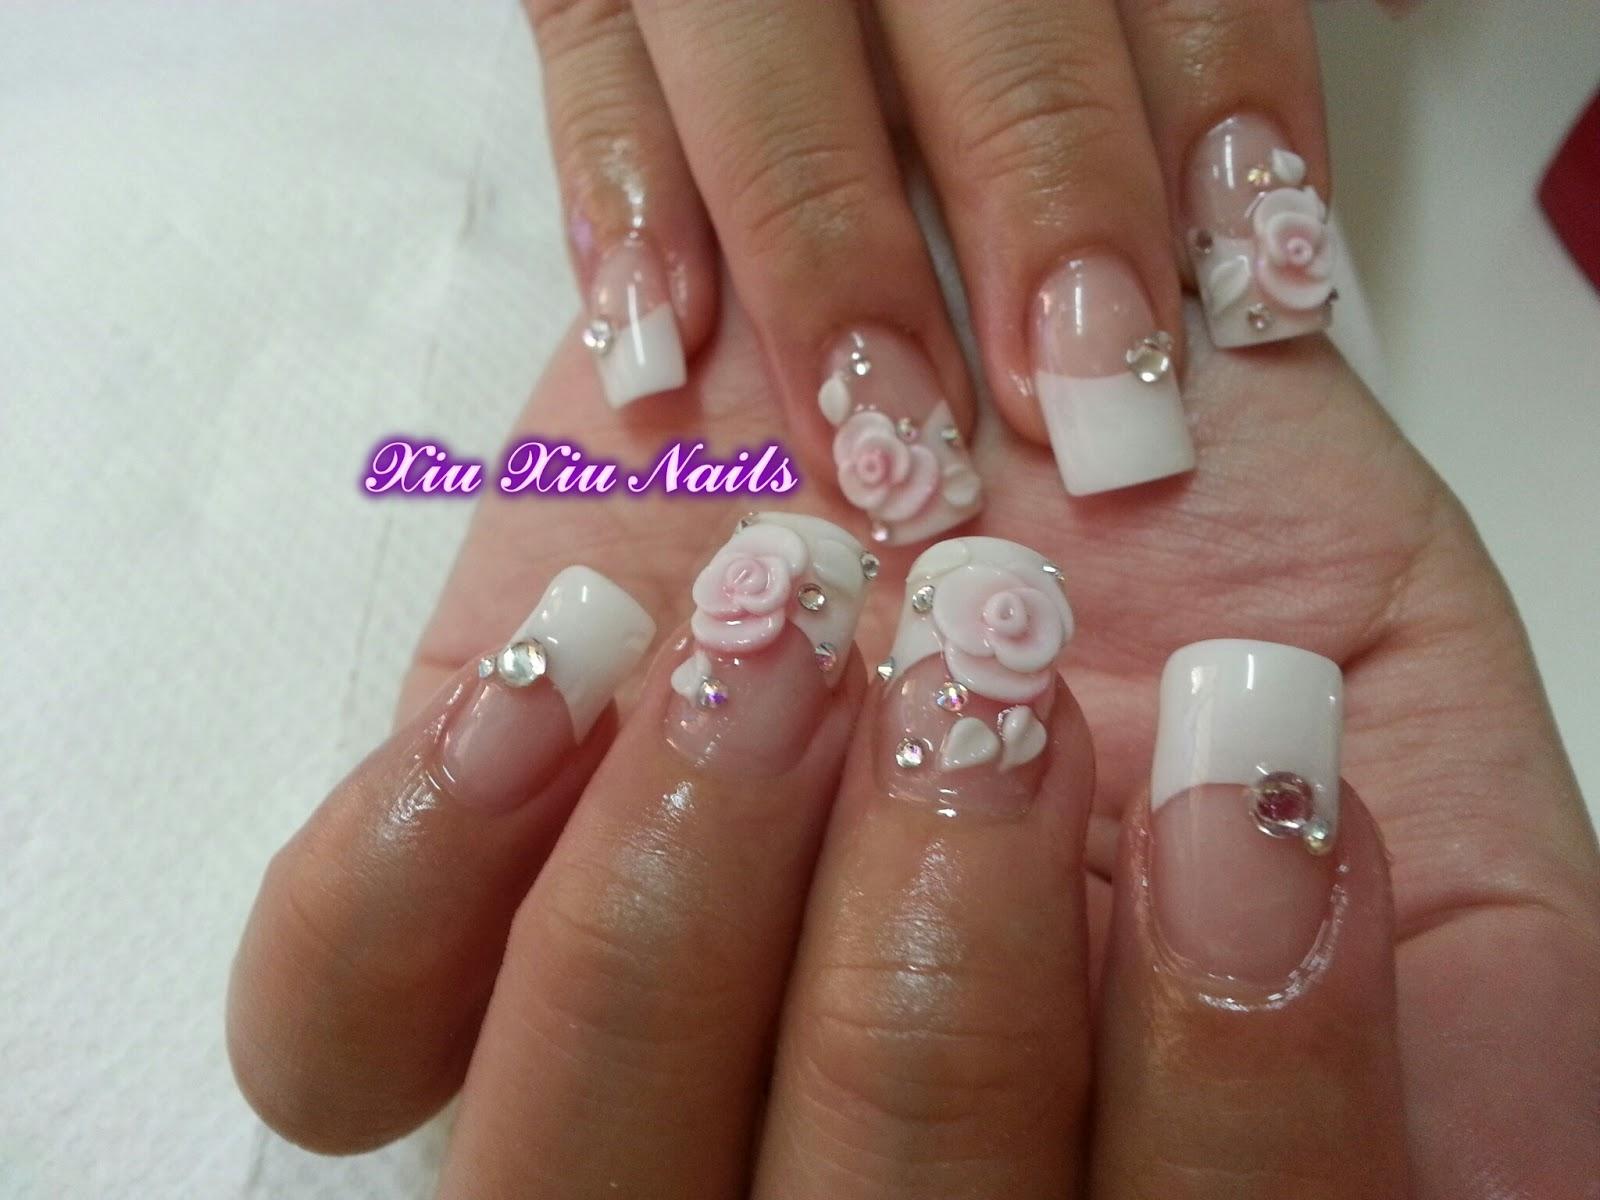 Xiu xiu nails: Bridal Nails